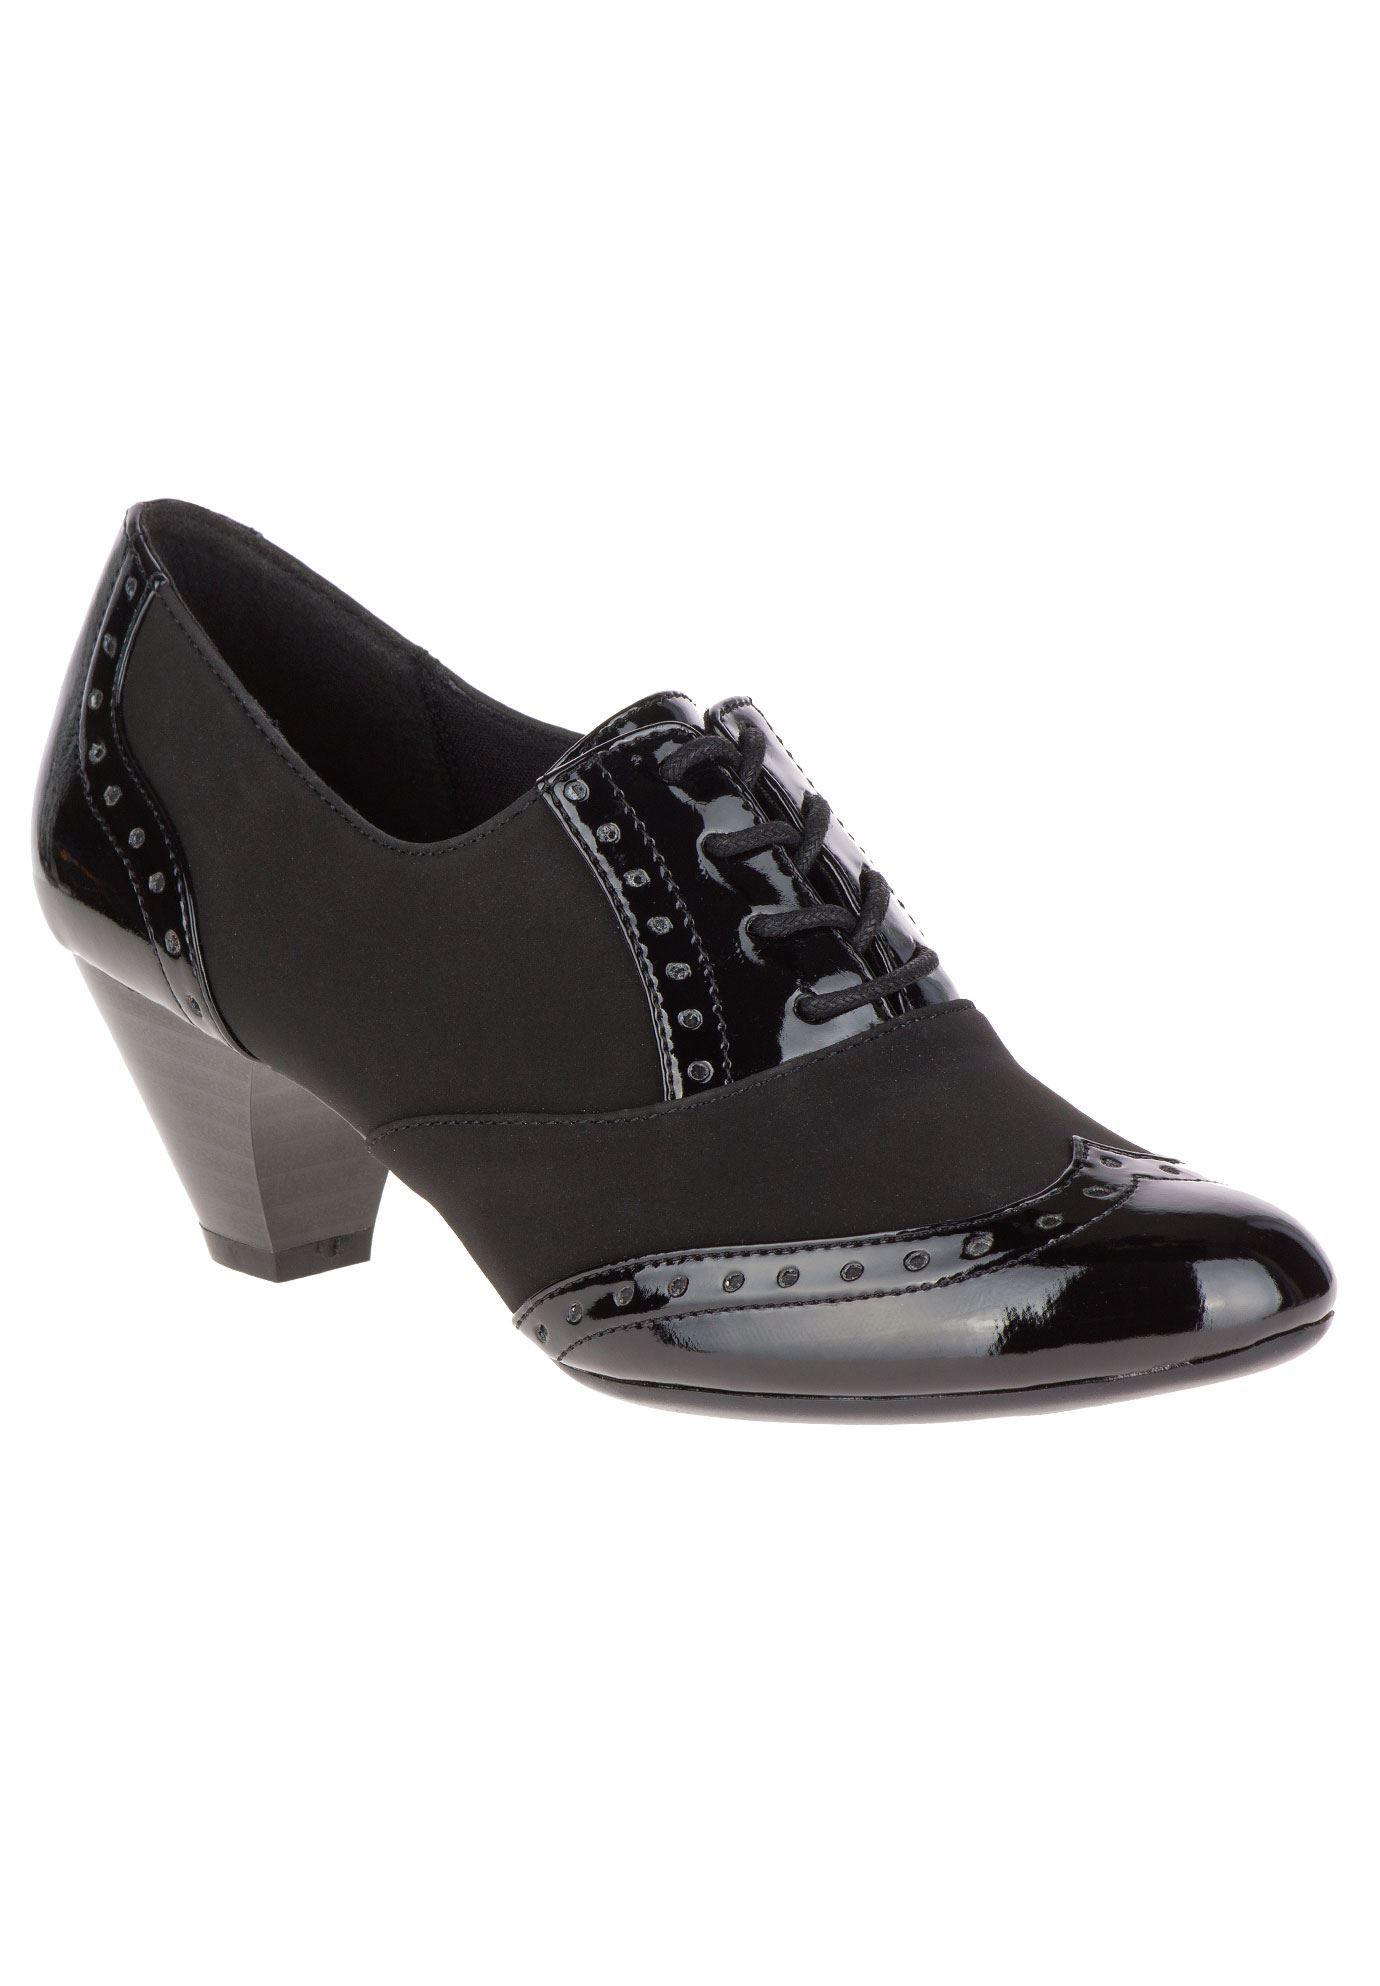 Women's Soft Style Gianna clearance really sast cheap online sale perfect dliSPWJk